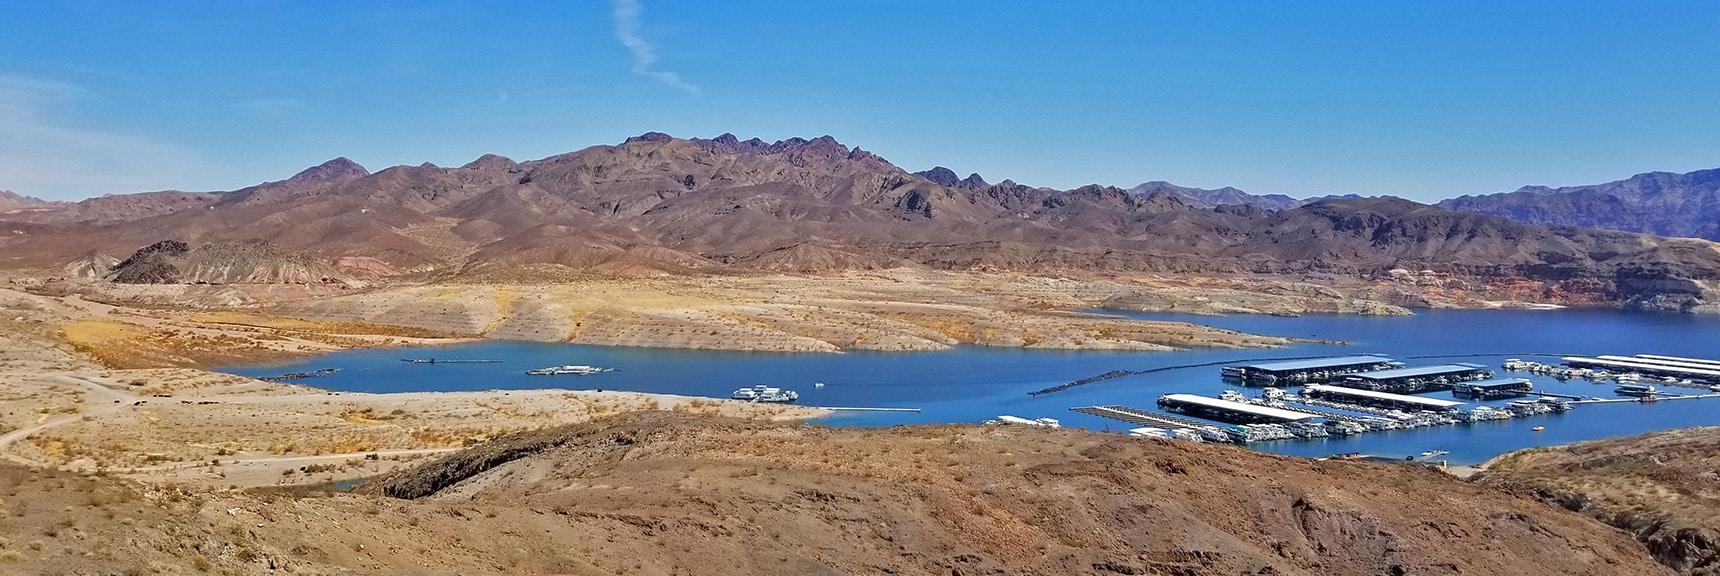 View Across Callville Bay Toward Hamblin Mountain Area   Callville Summit Trail   Lake Mead National Recreation Area, Nevada